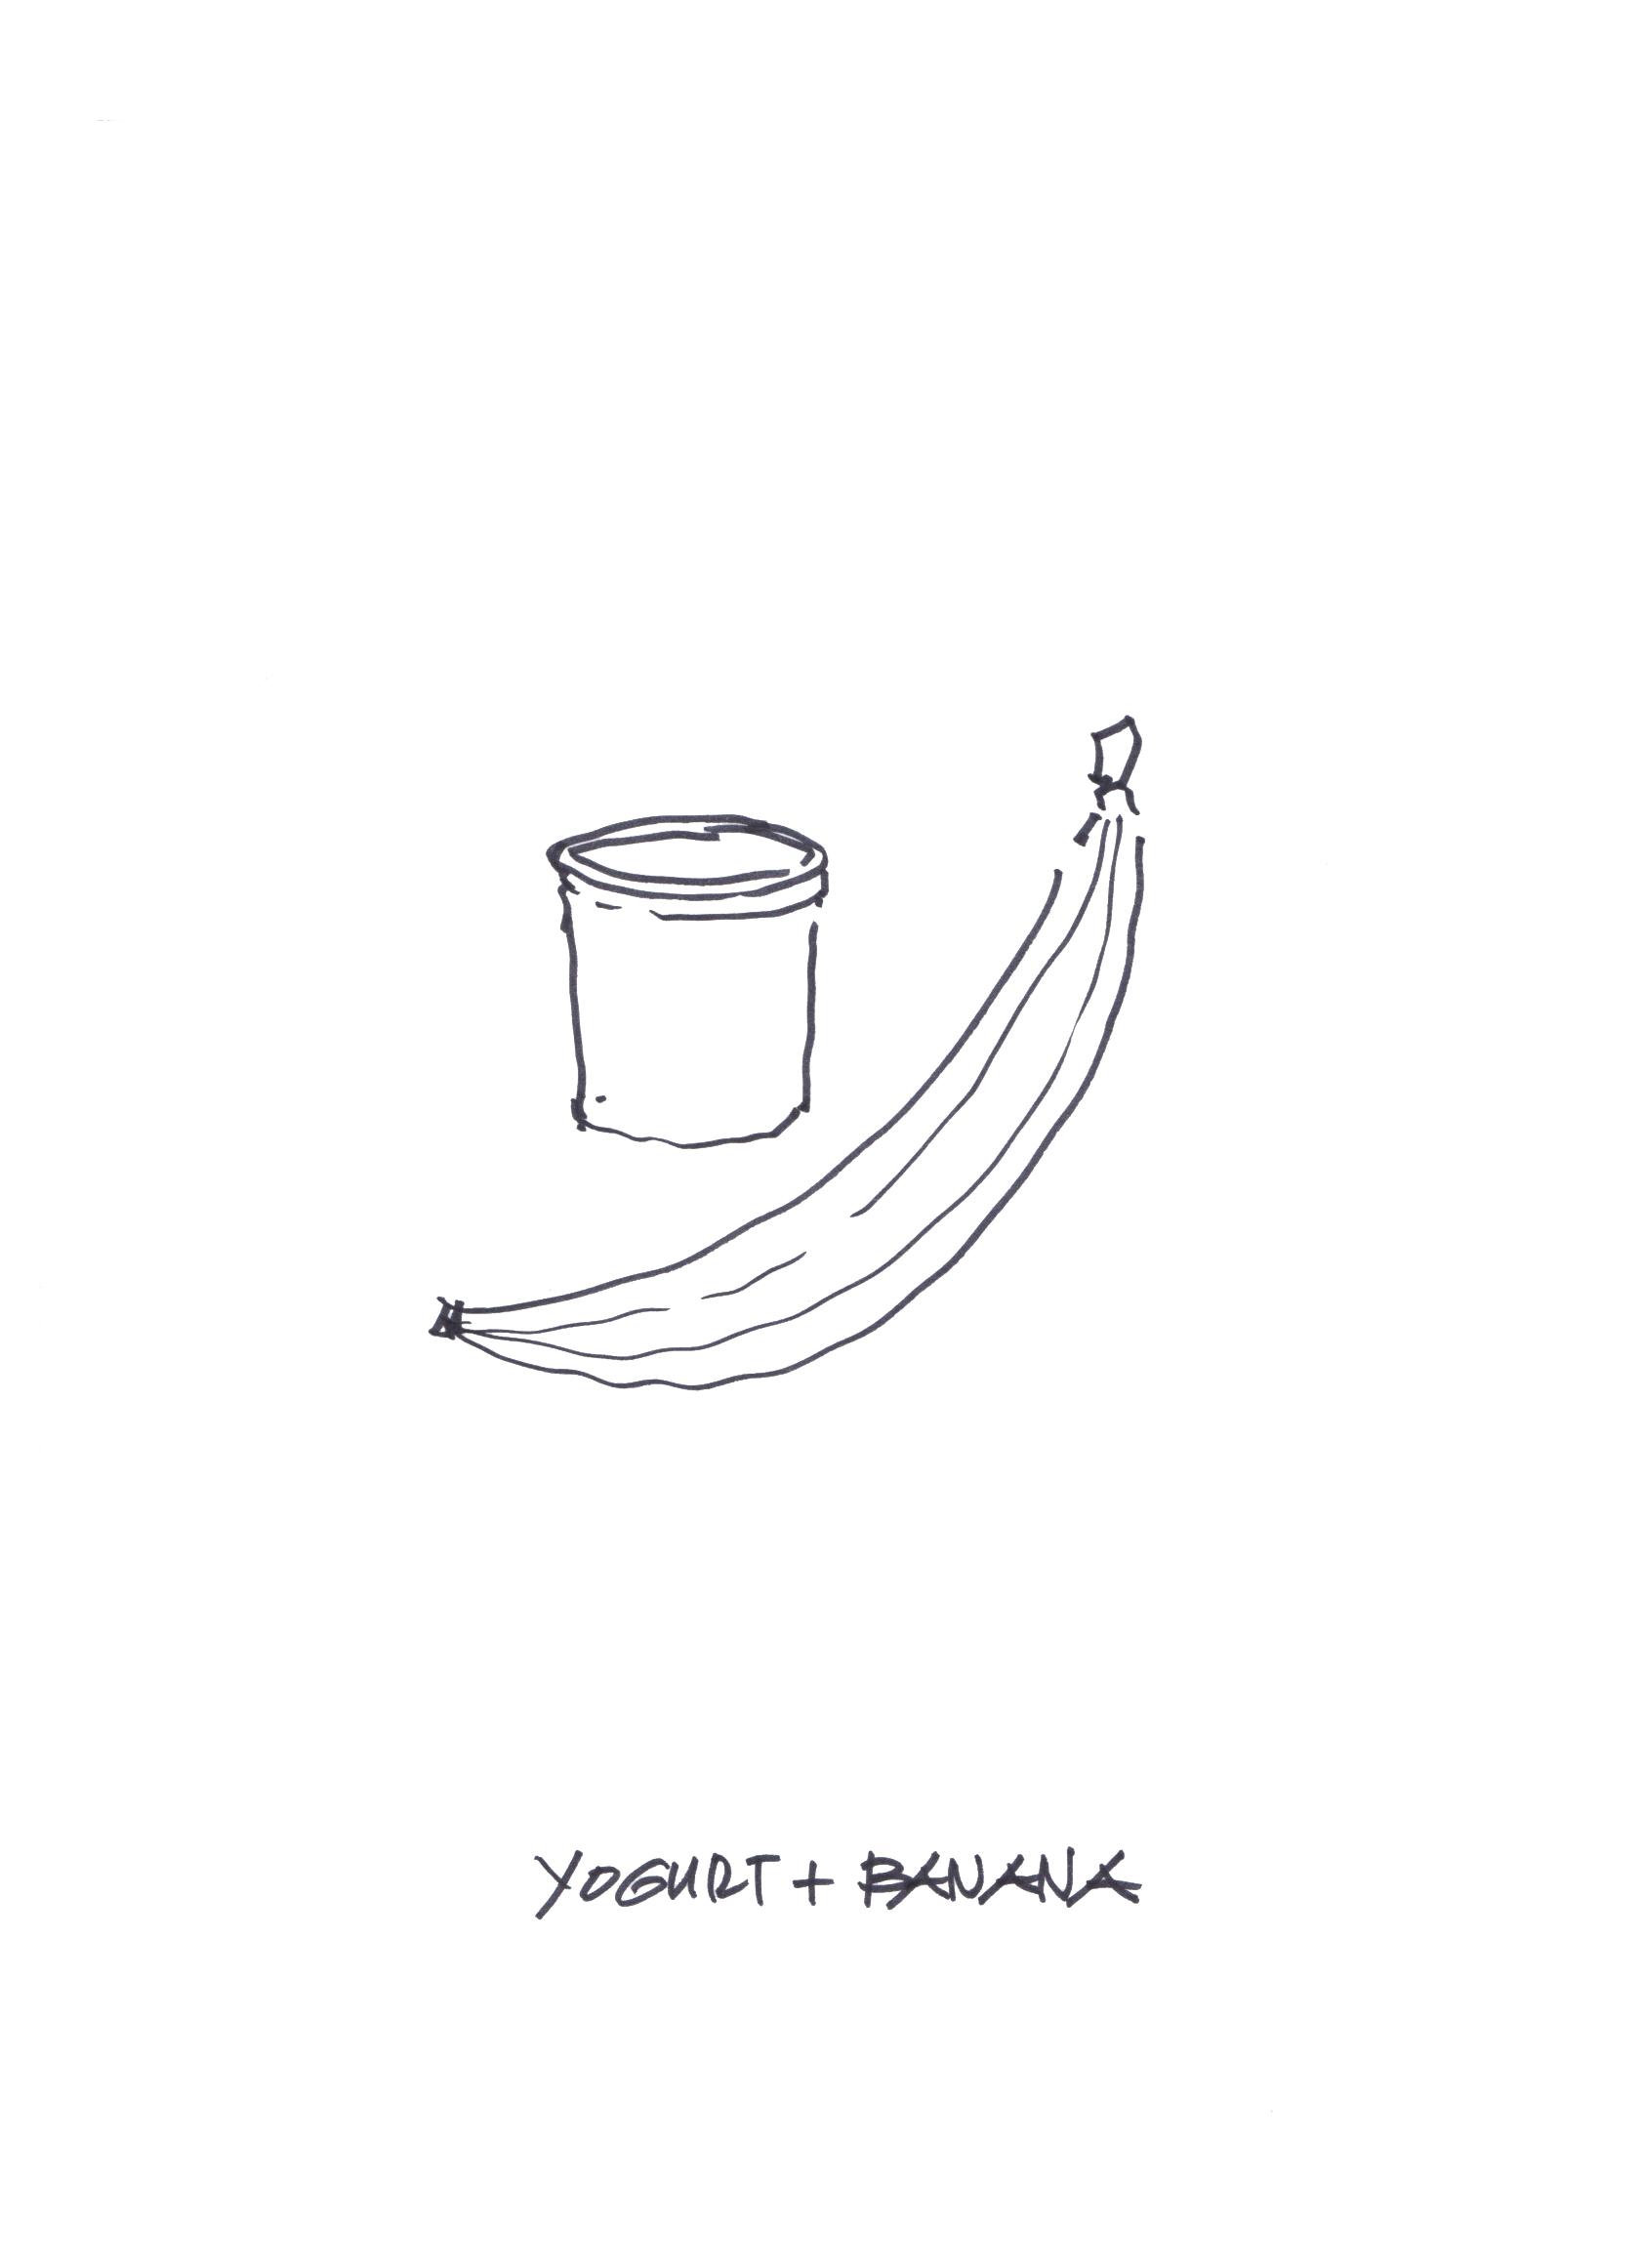 Yogurt and Banana